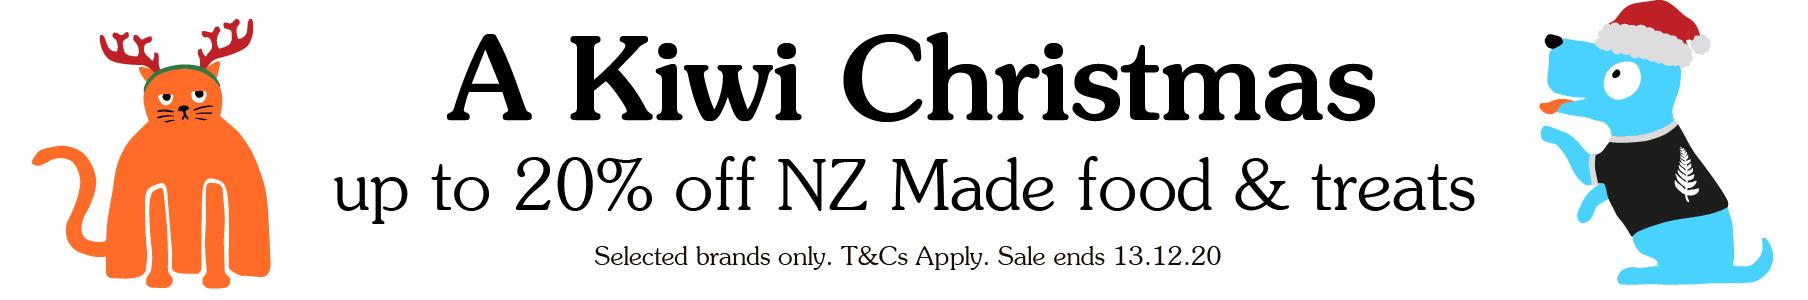 kiwi-christmas-category-banner-new.jpg